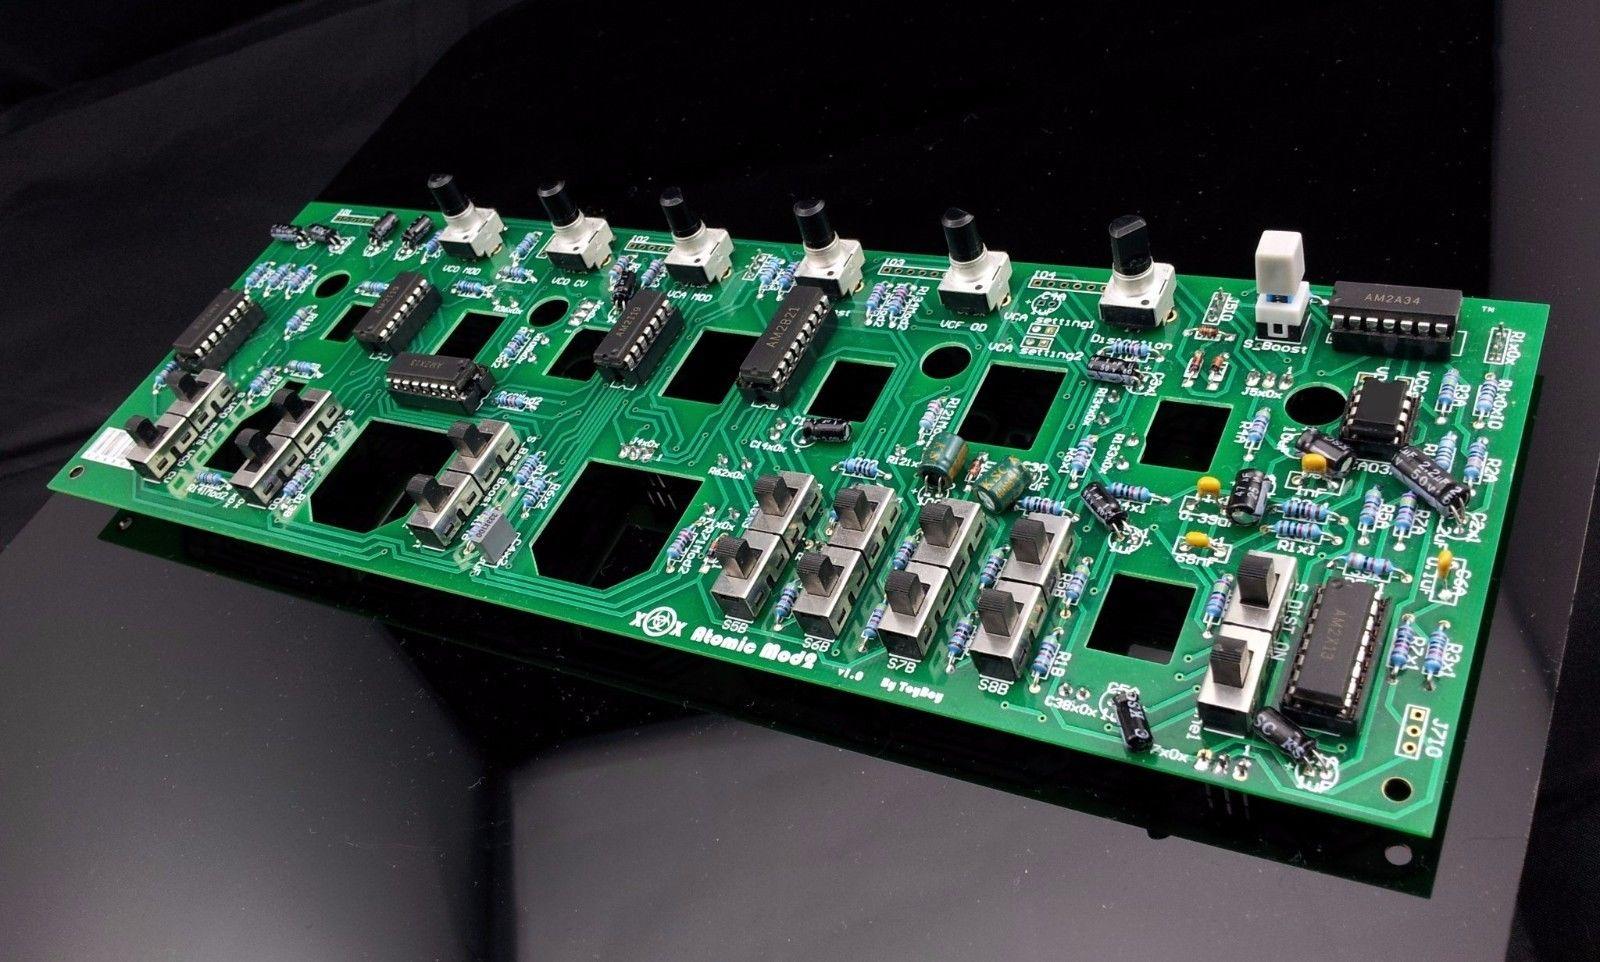 MATRIXSYNTH: x0xb0x Atomic Mod II un-assemble DIY kit for xoxbox